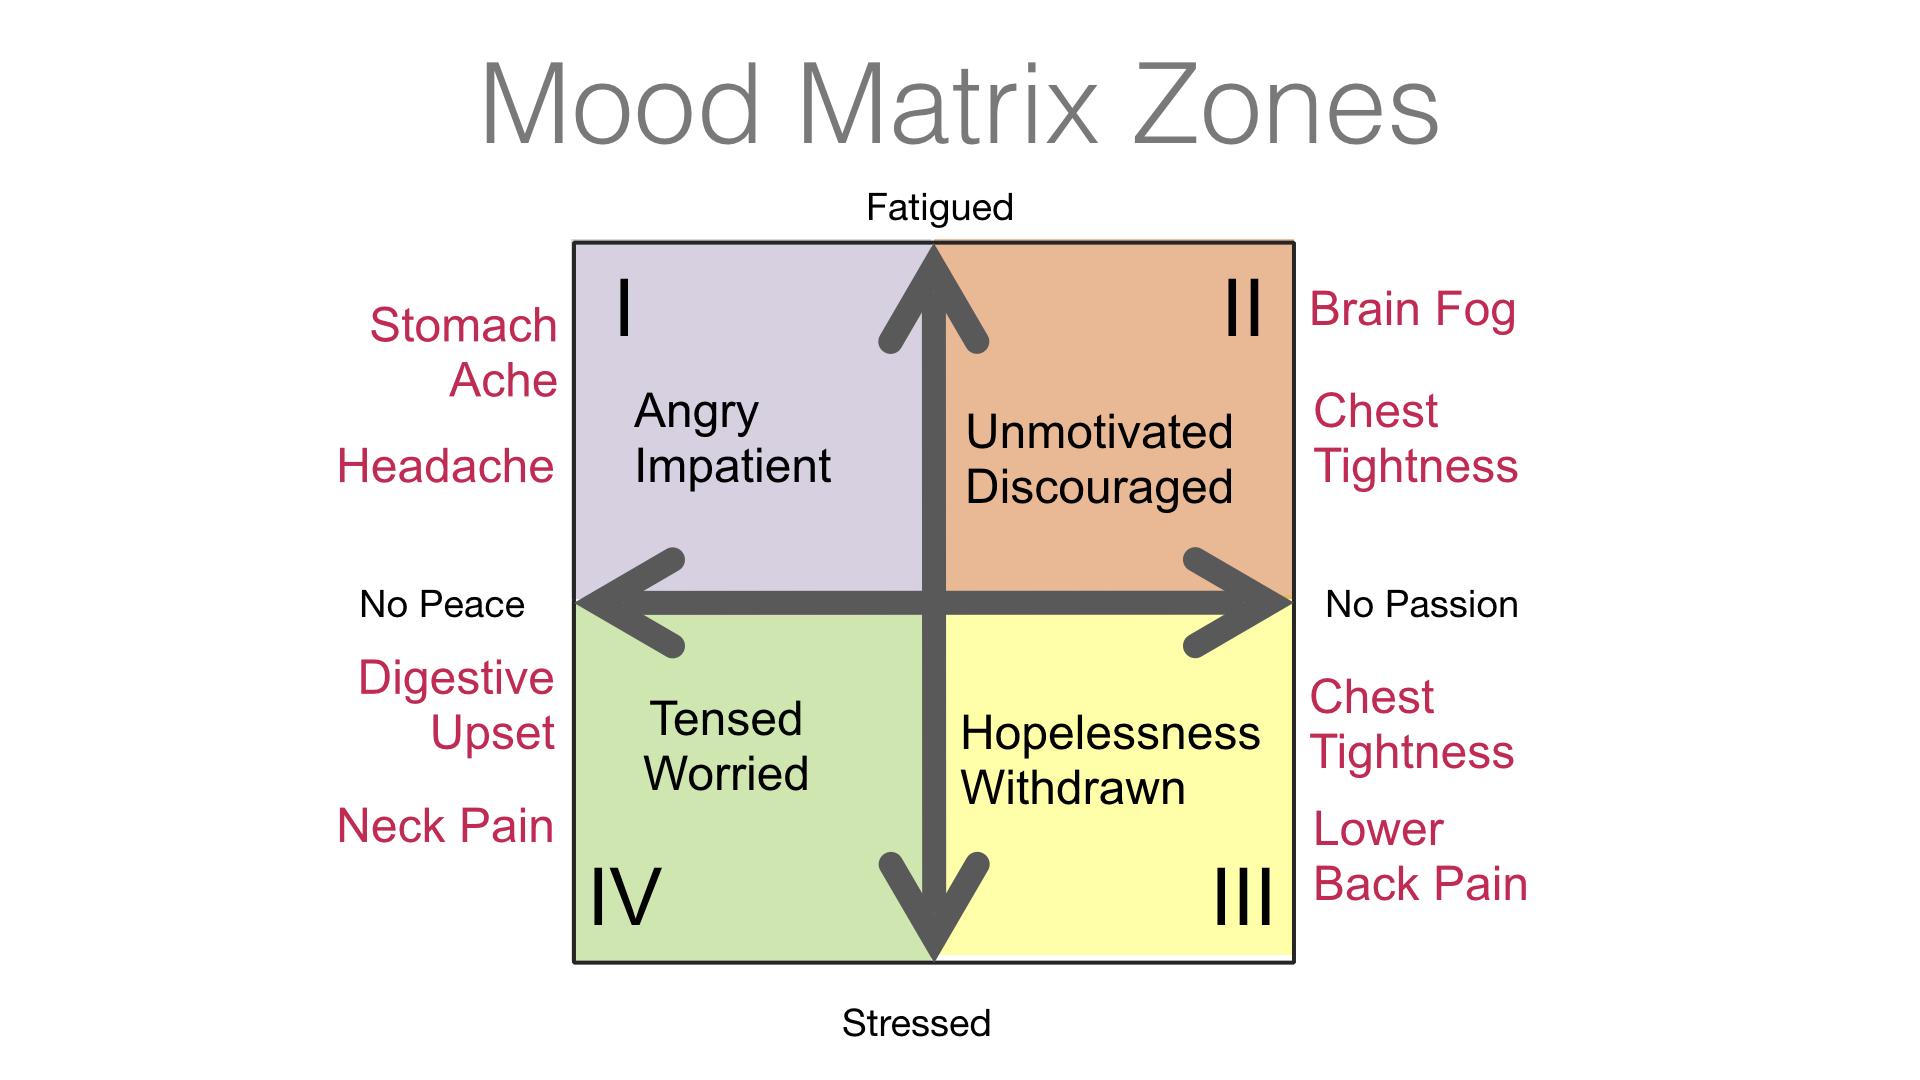 Mood Matrix001 Jade Balden